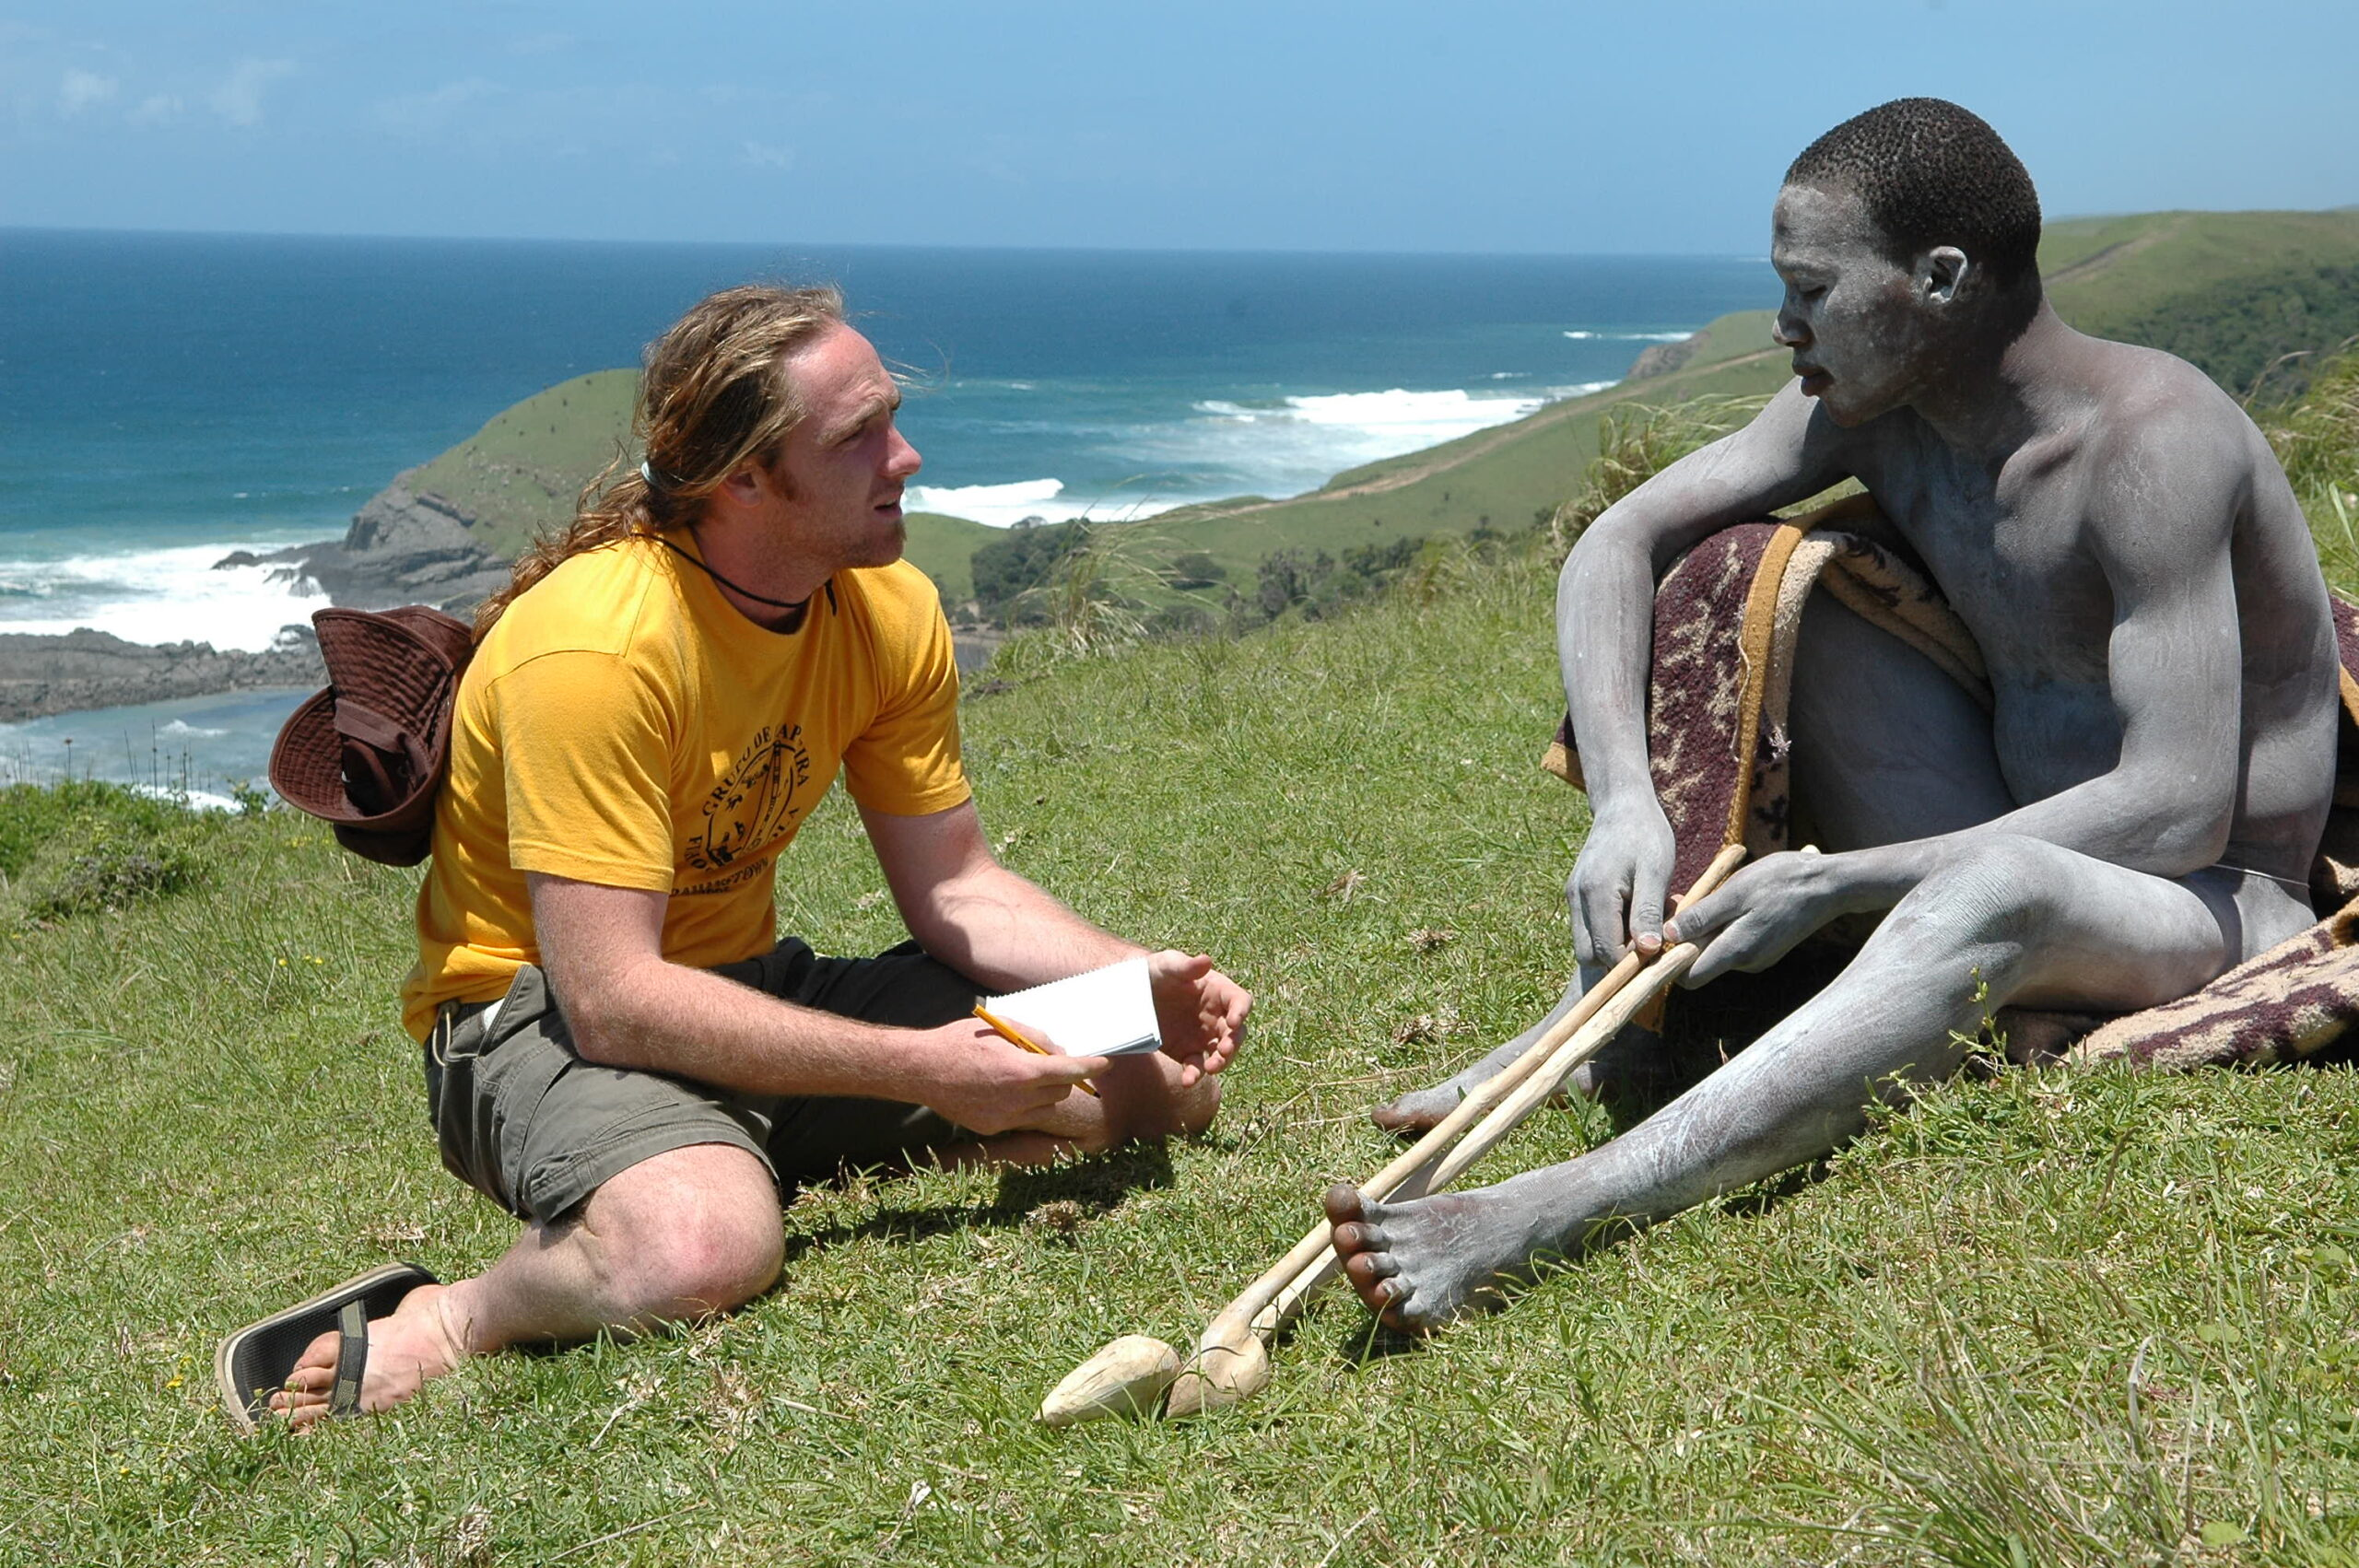 Fotografiereis Zuid-Afrika door Tom van der Leij rondreis Transkei en Wildcoast Abakwetha